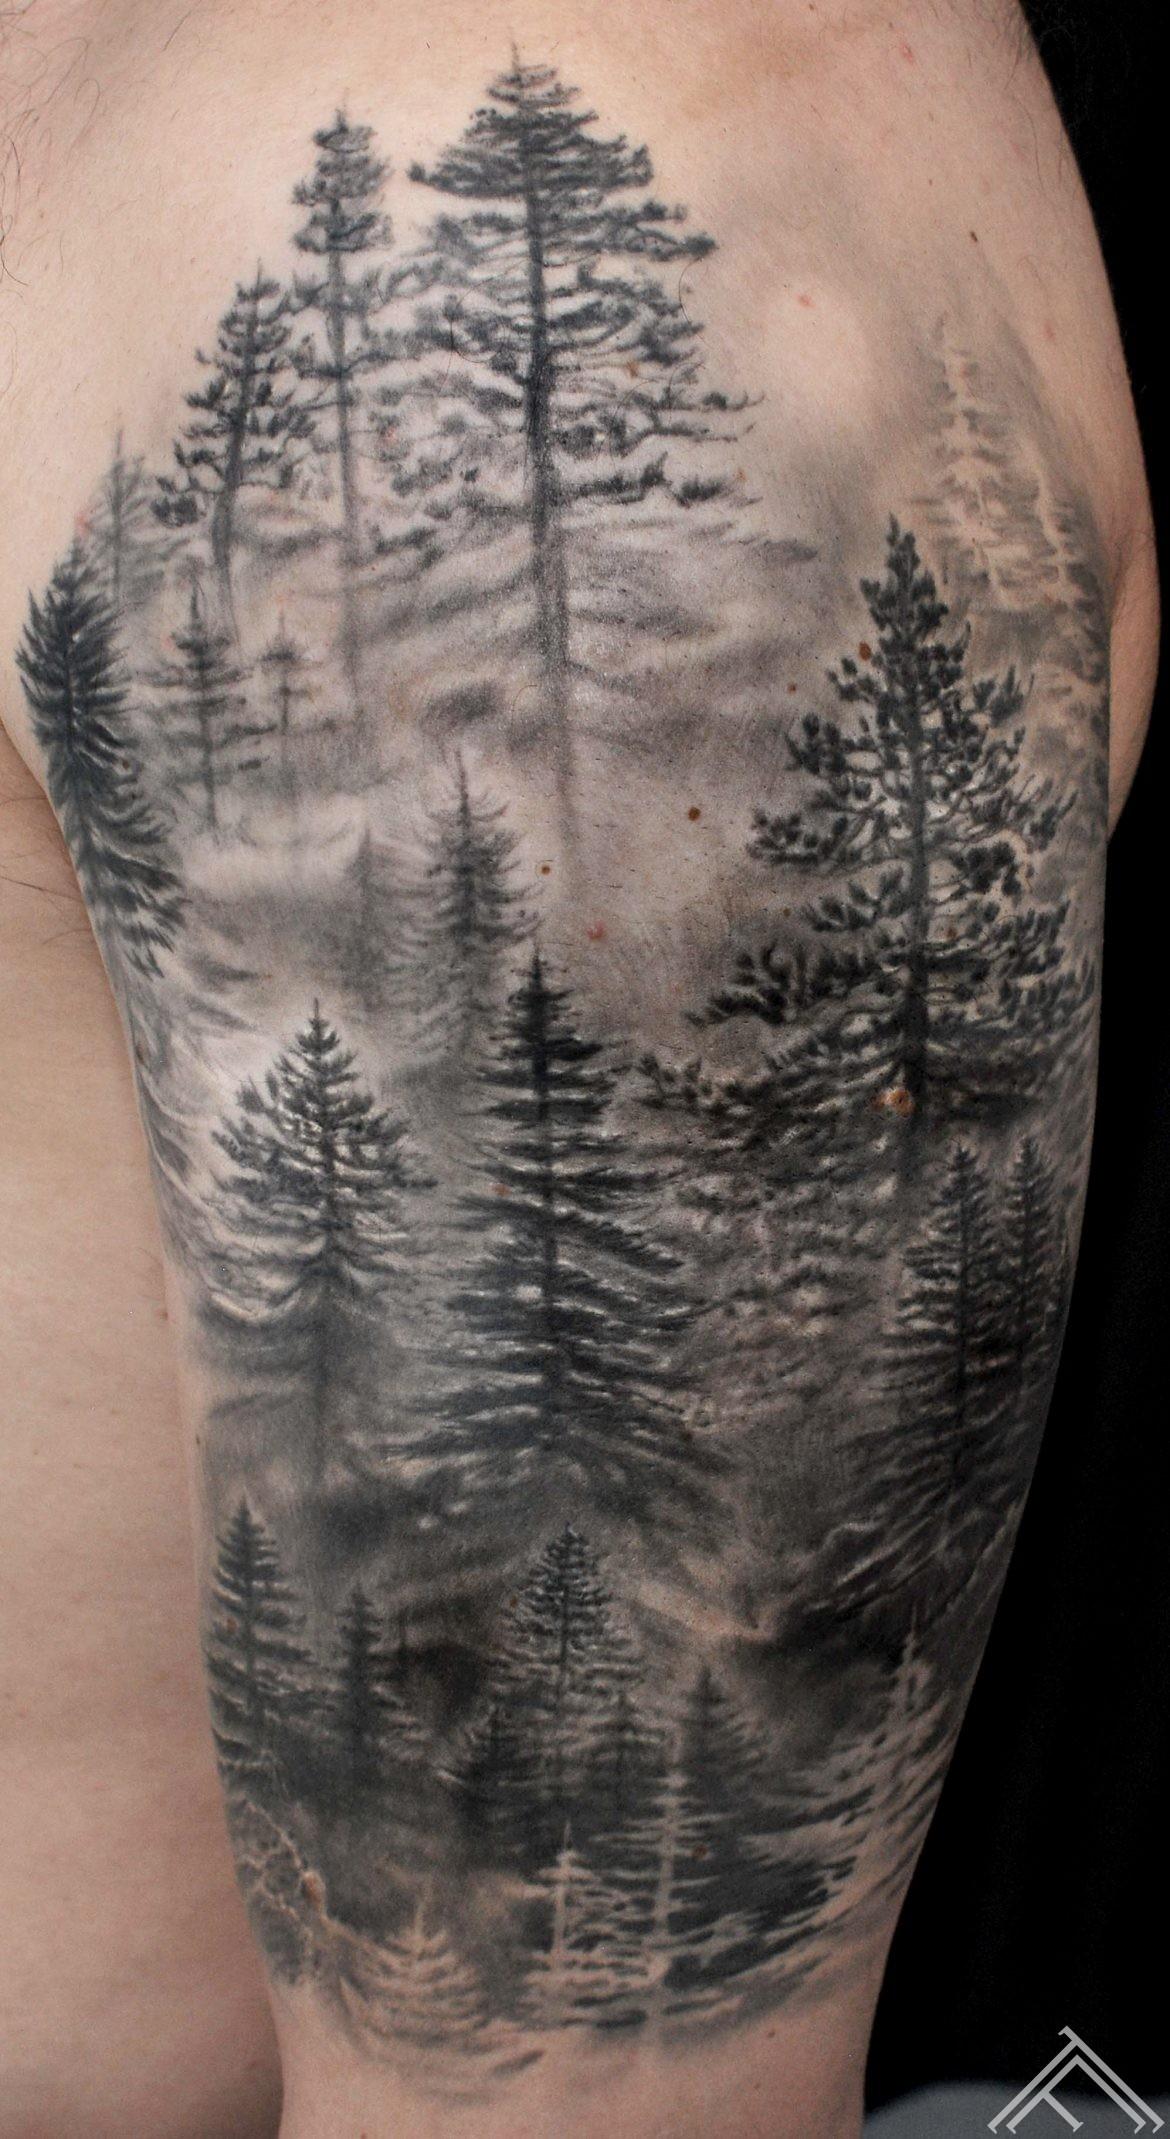 pine-forest-elge-priedes-mezs-tattoo-tattoofrequency-marispavlo-studija-tetovejums